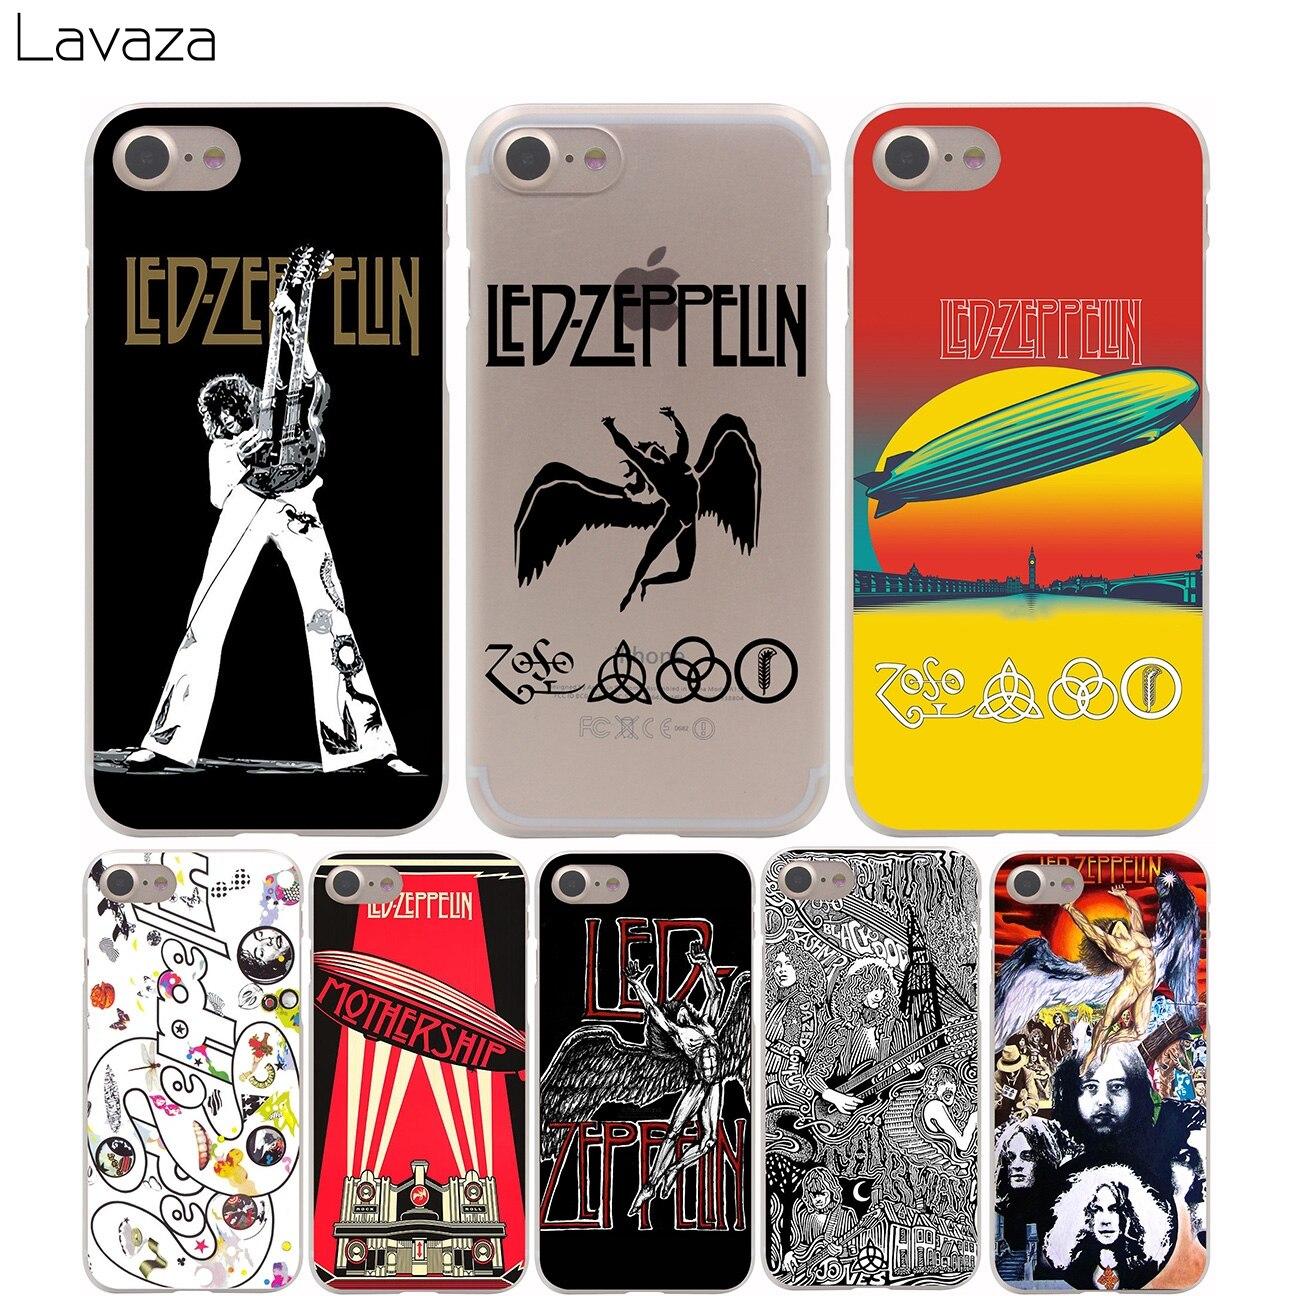 reputable site 6d1e0 0111a Lavaza Led Zeppelin Cover Case for iPhone X 10 8 7 Plus 6 6S Plus 5 5S SE  5C 4 4S Cases on Aliexpress.com   Alibaba Group